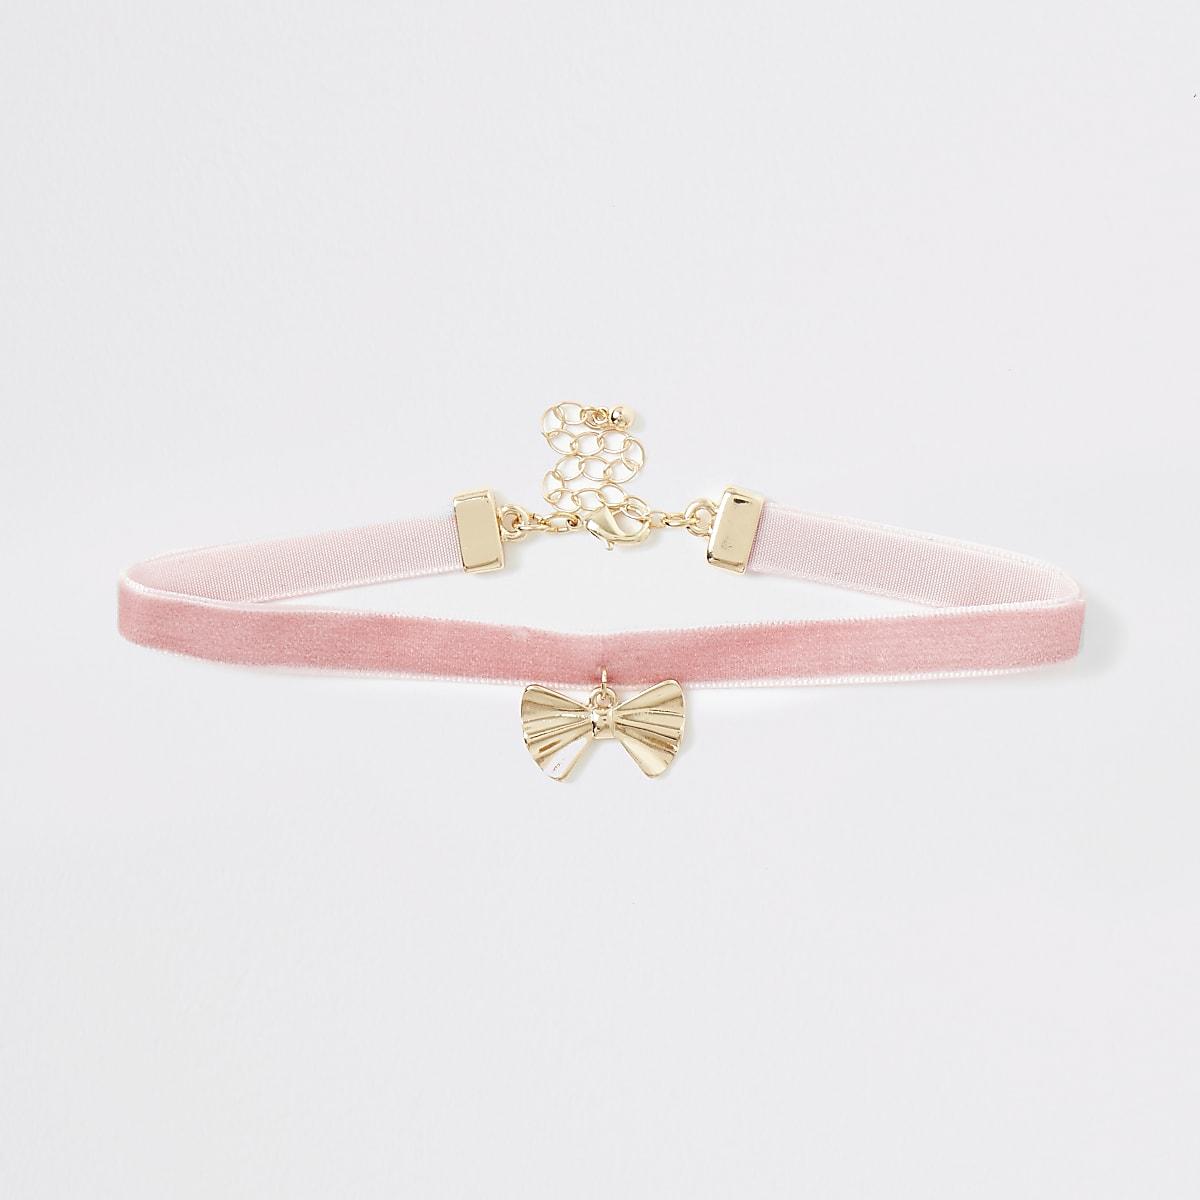 Roze RI-choker met hartje voor meisjes